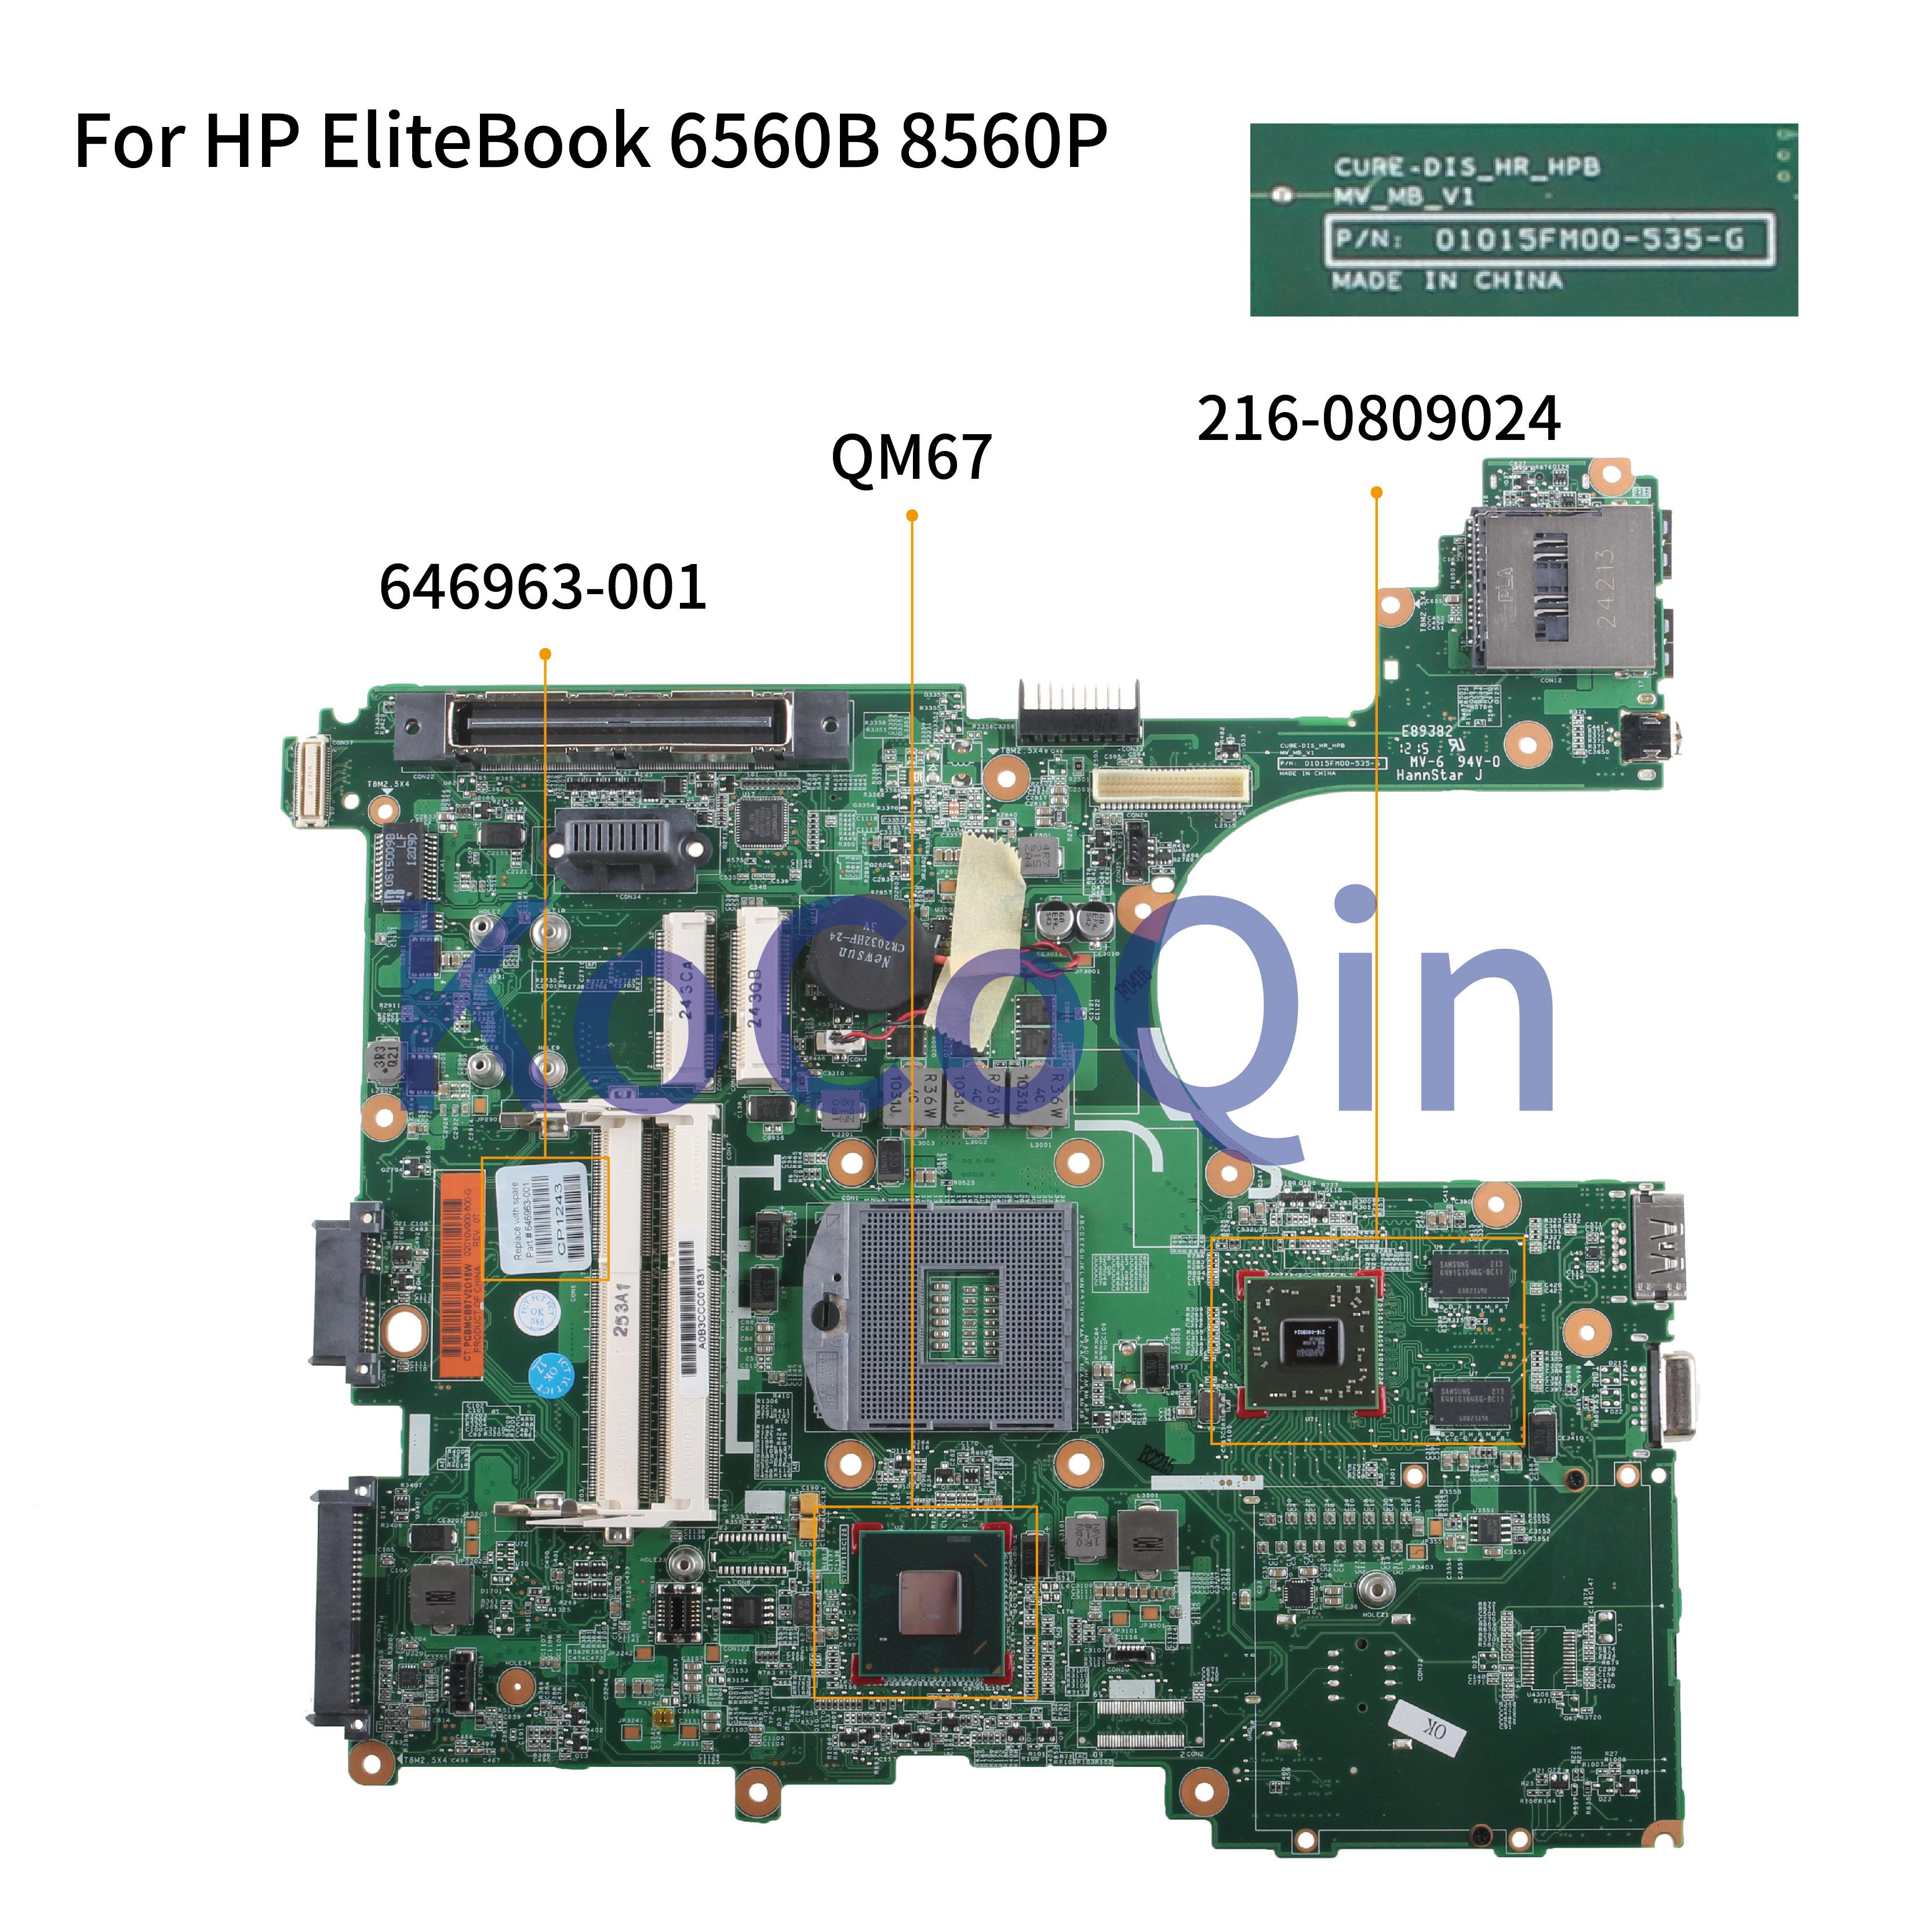 Placa base de ordenador portátil KoCoQin para HP EliteBook 6560B 8560P placa base 646963-001 646963-501 0105FM00 QM67 1G 216-0809024